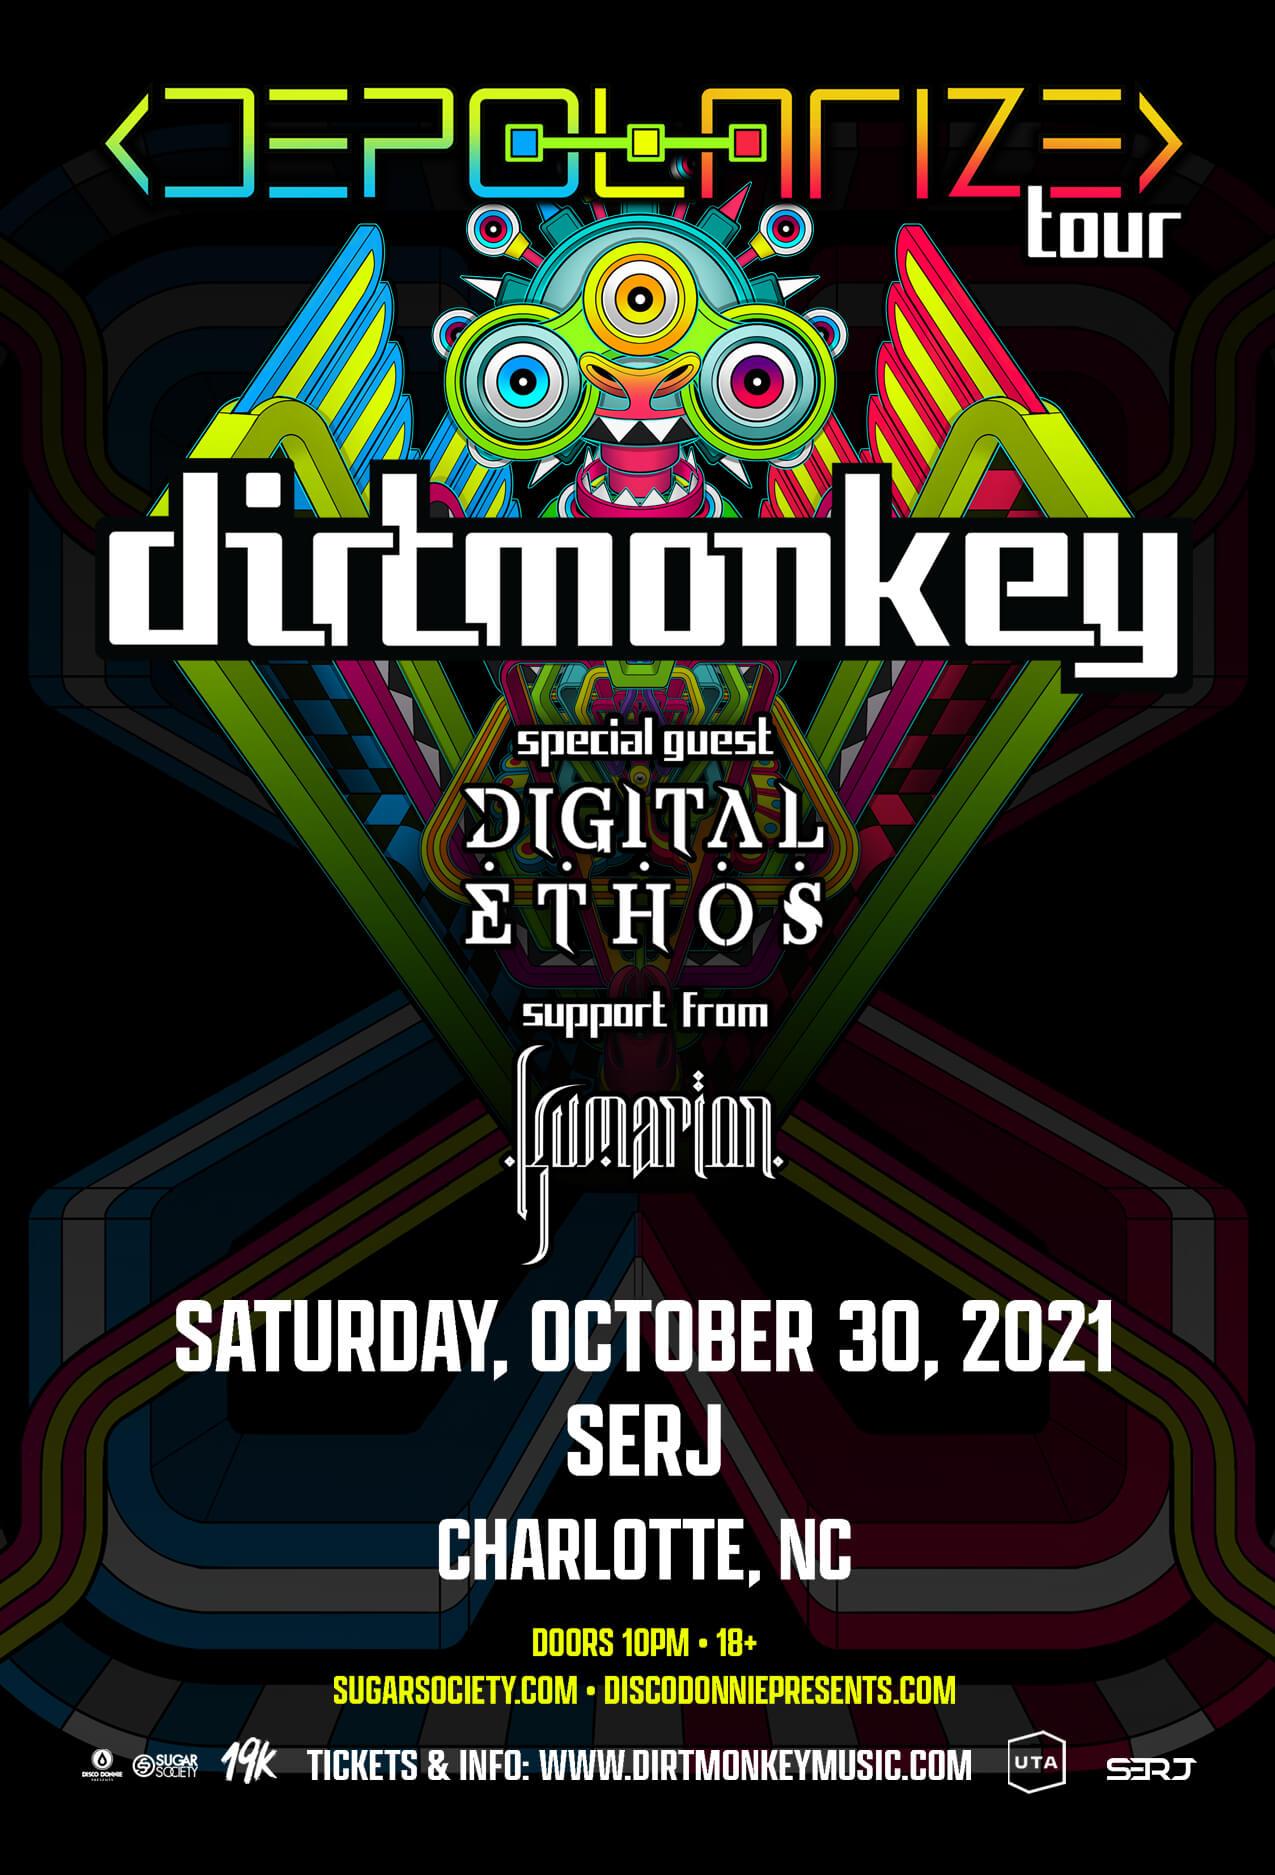 Dirt Monkey in Charlotte